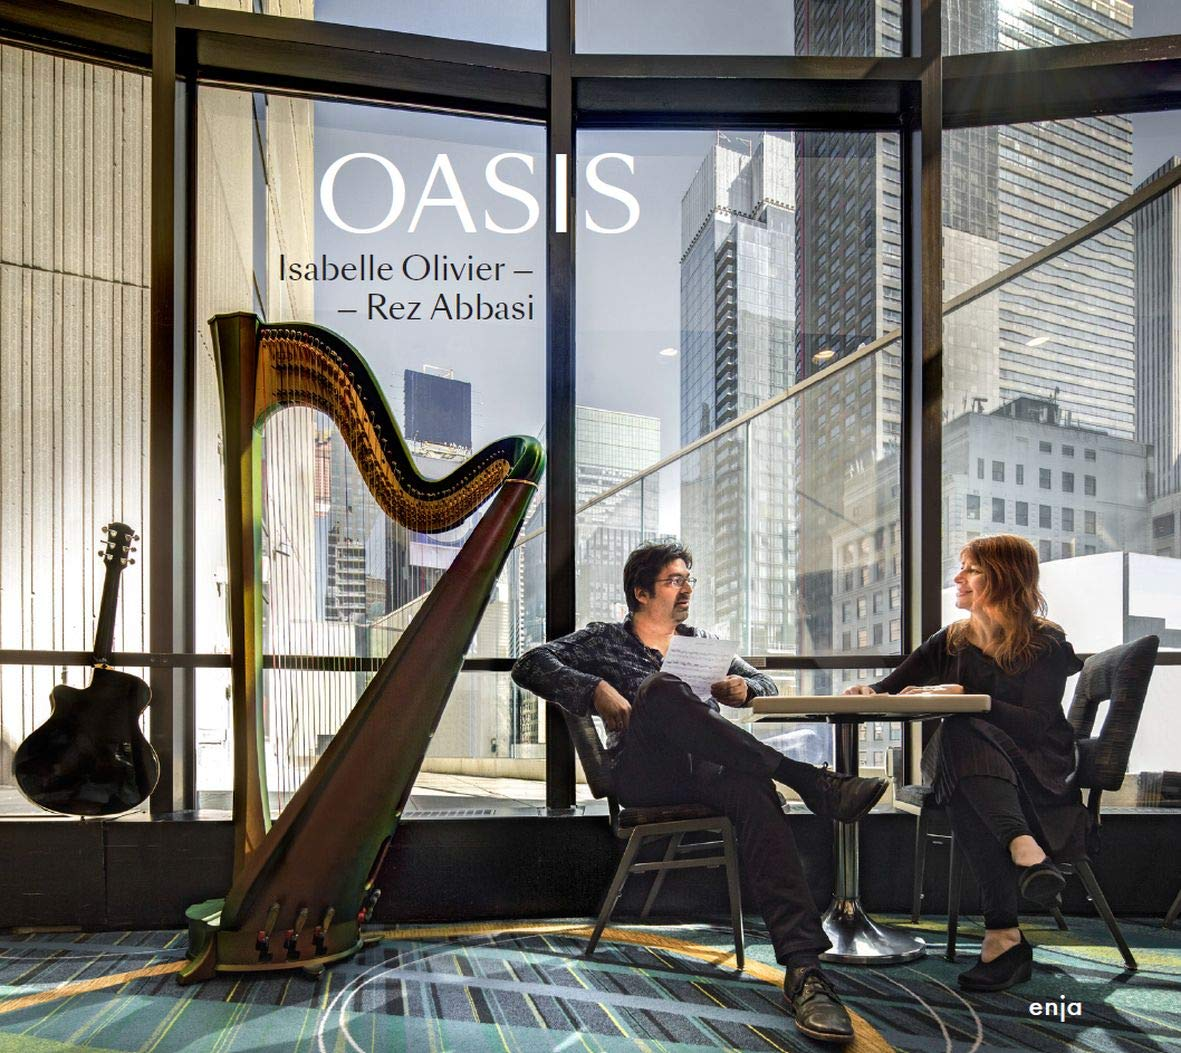 REZ ABBASI - Isabelle Olivier & Rez Abbasi : Oasis cover